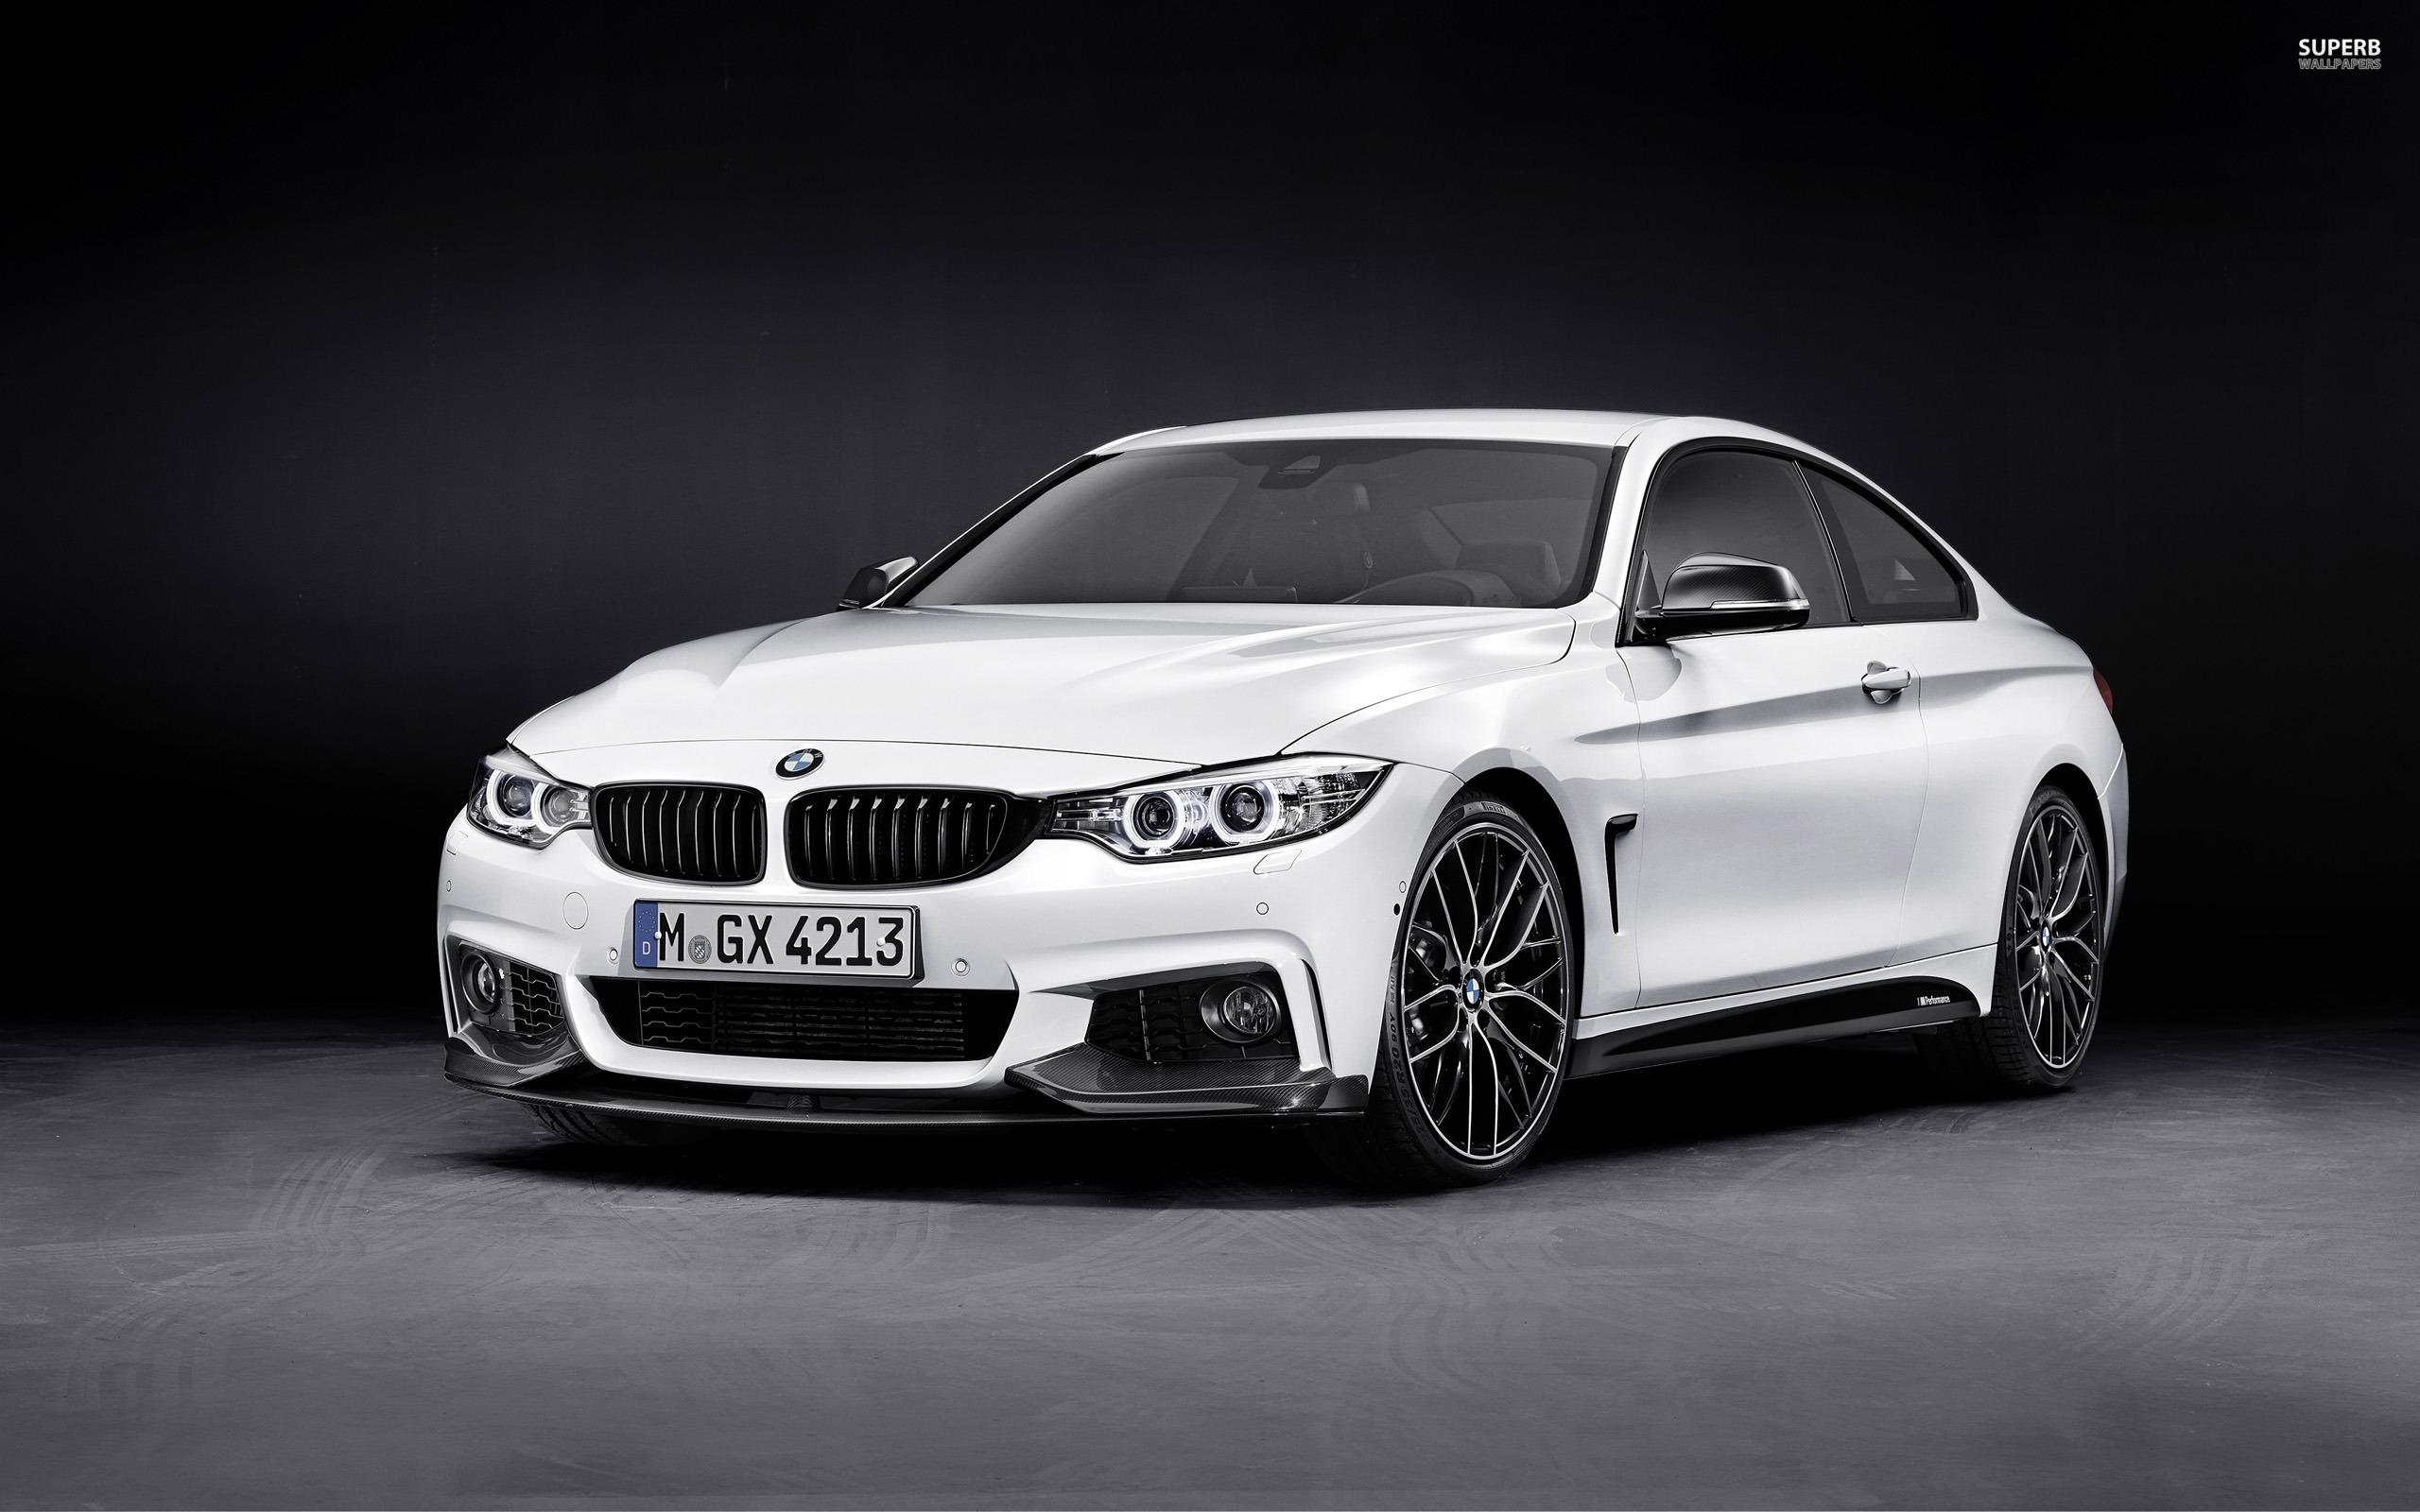 2014 BMW M4 wallpaper 2560x1600 jpg